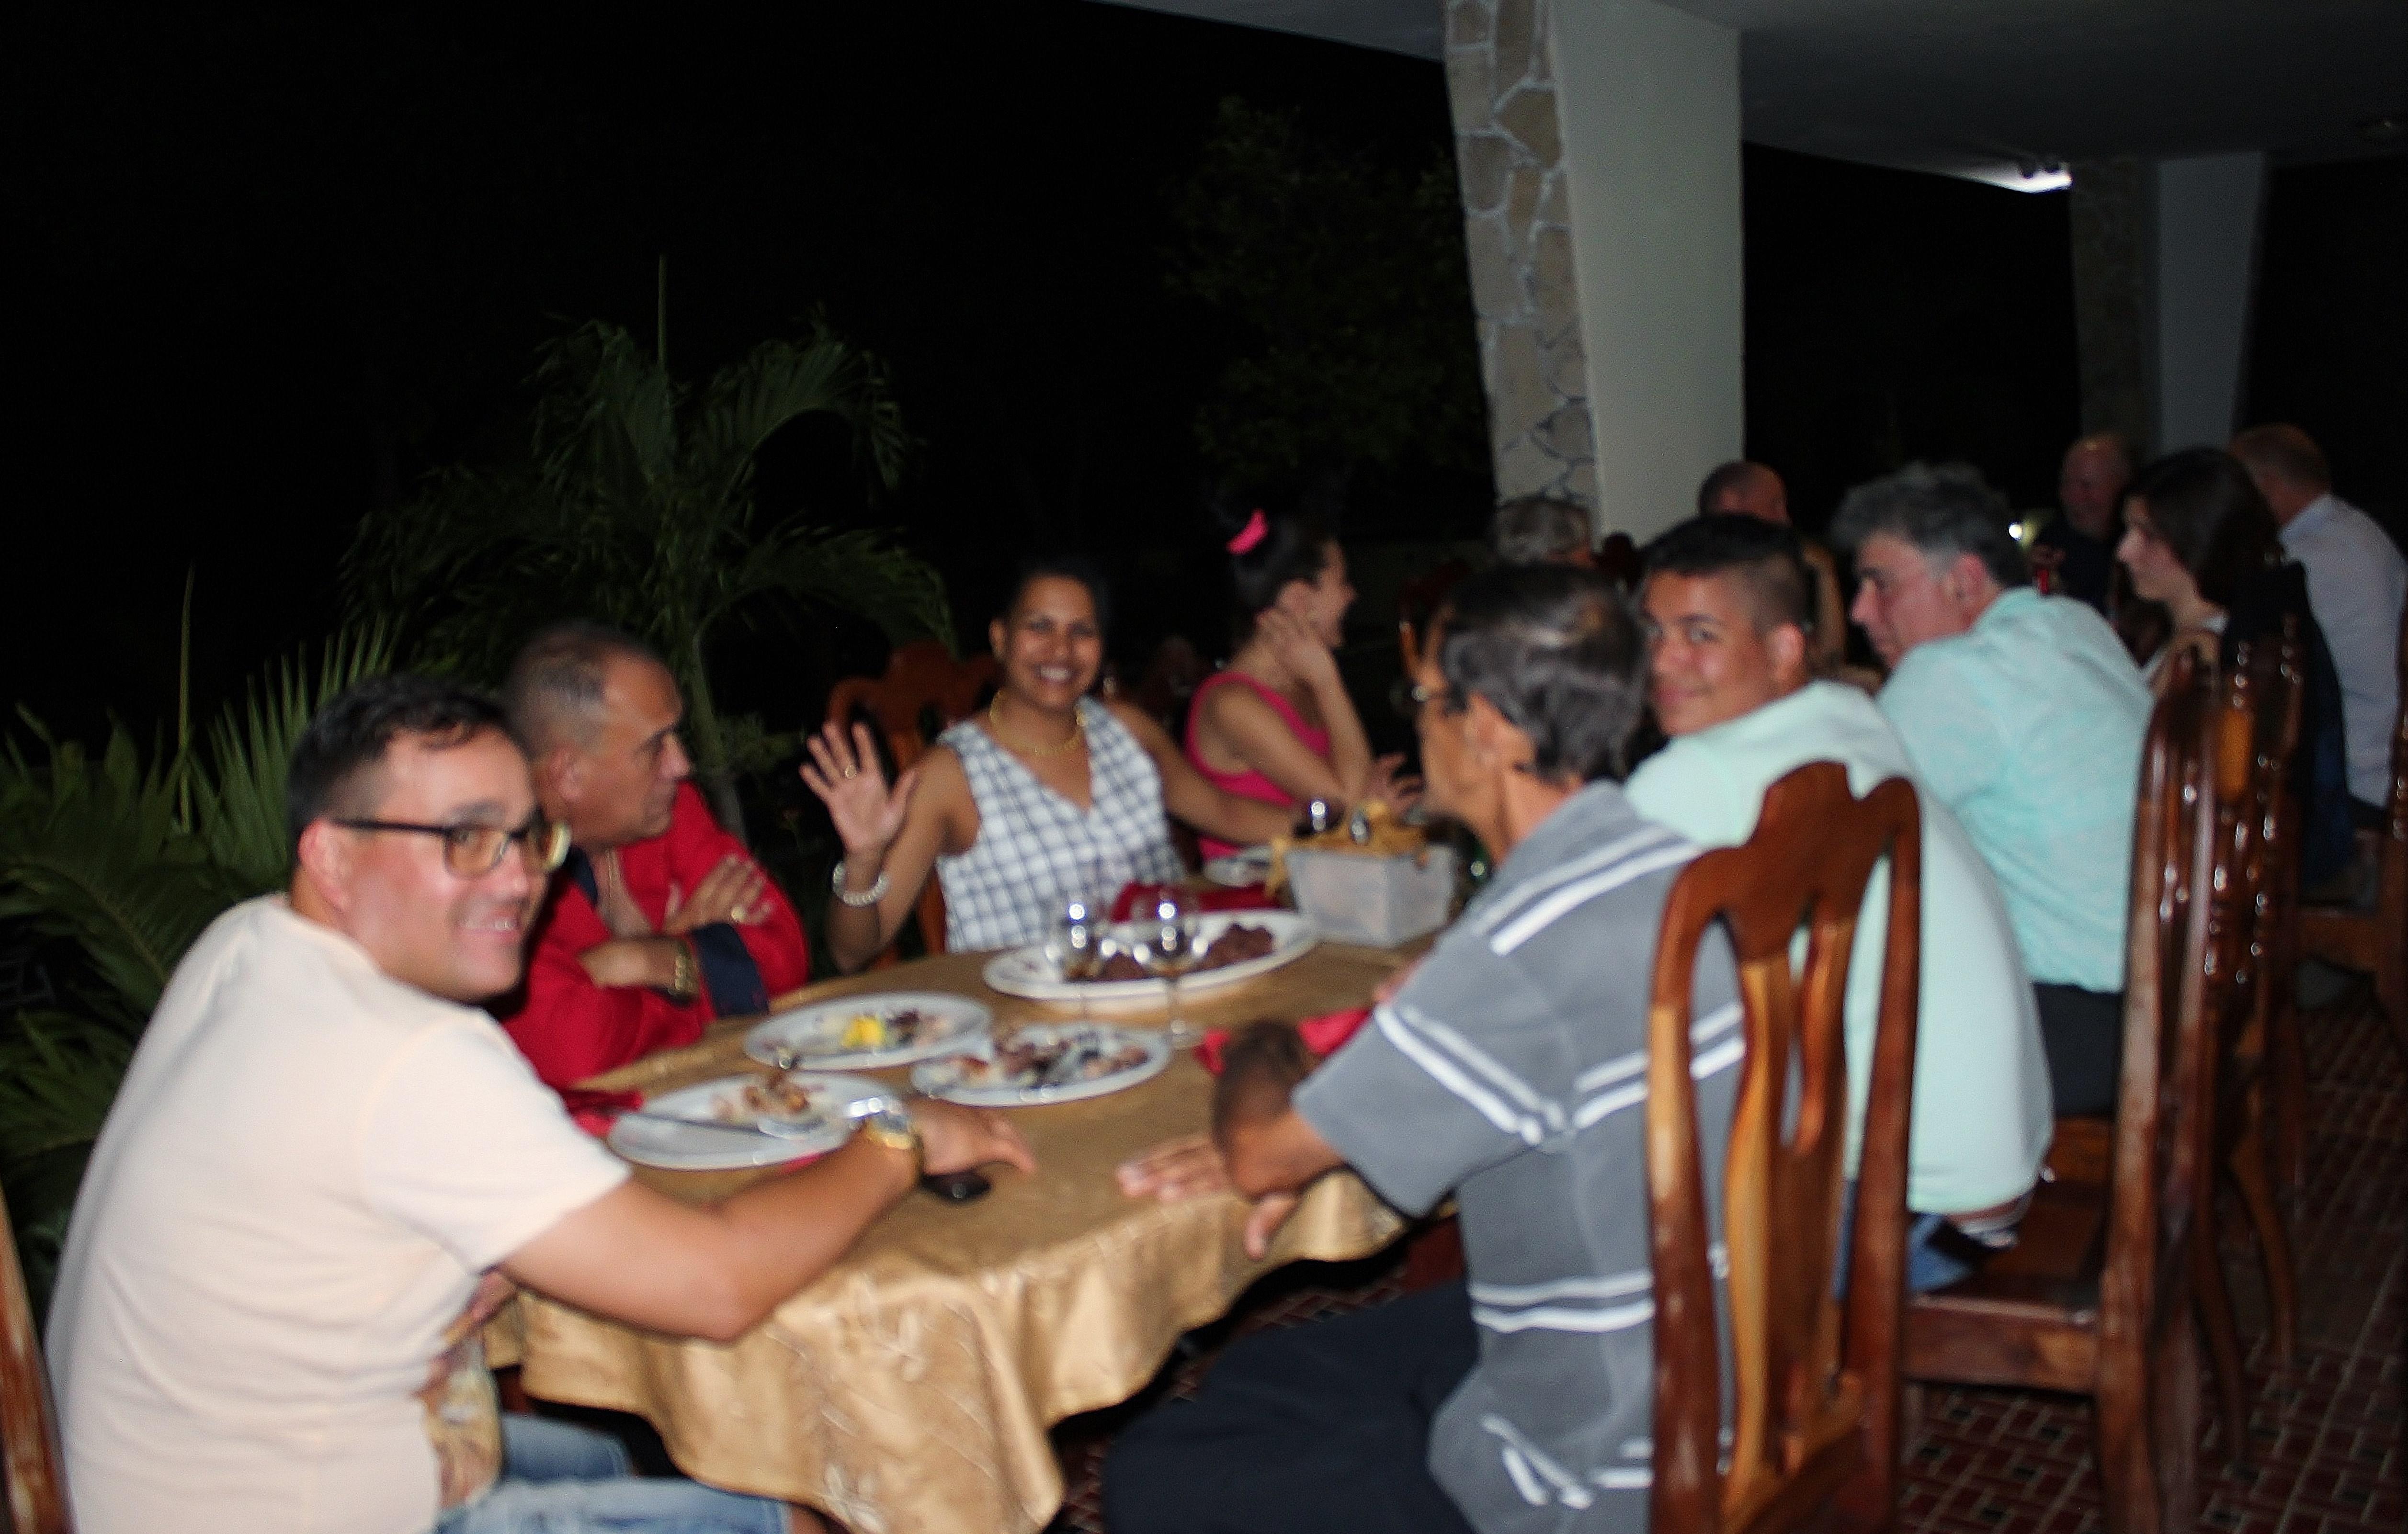 New-Years-Dinner-Trinidad-Cuba A Cuban Road Trip, Part 2 - Trinidad Cuba Trinidad